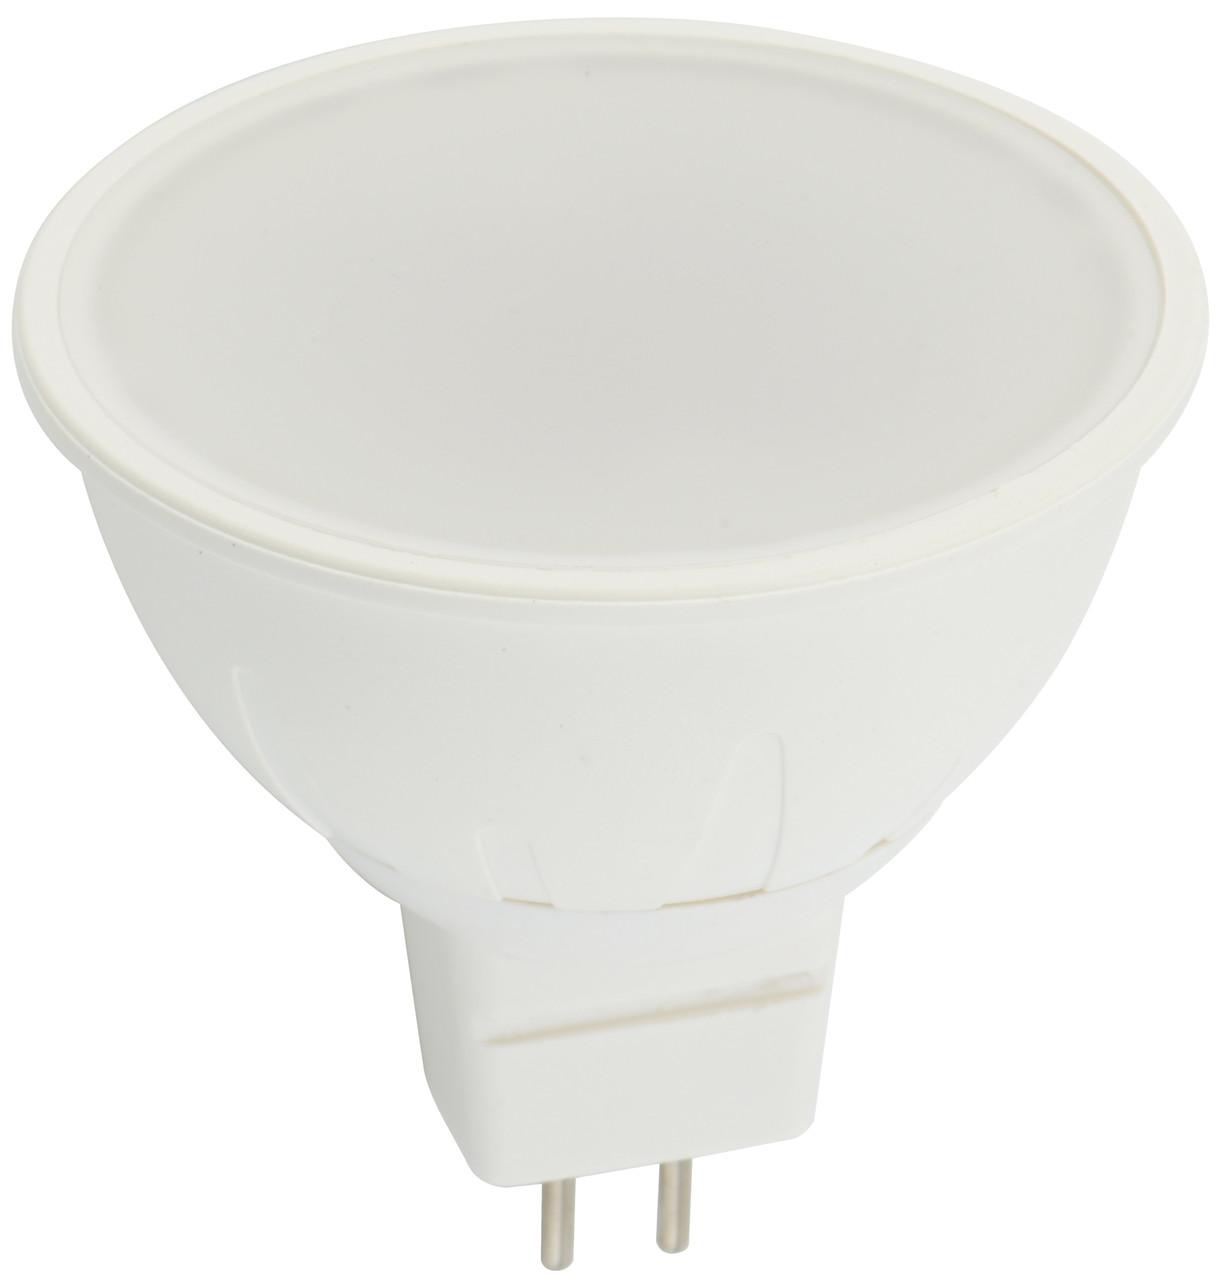 Лампа светодиодная G-tech MR16-6w-480lm-теплый